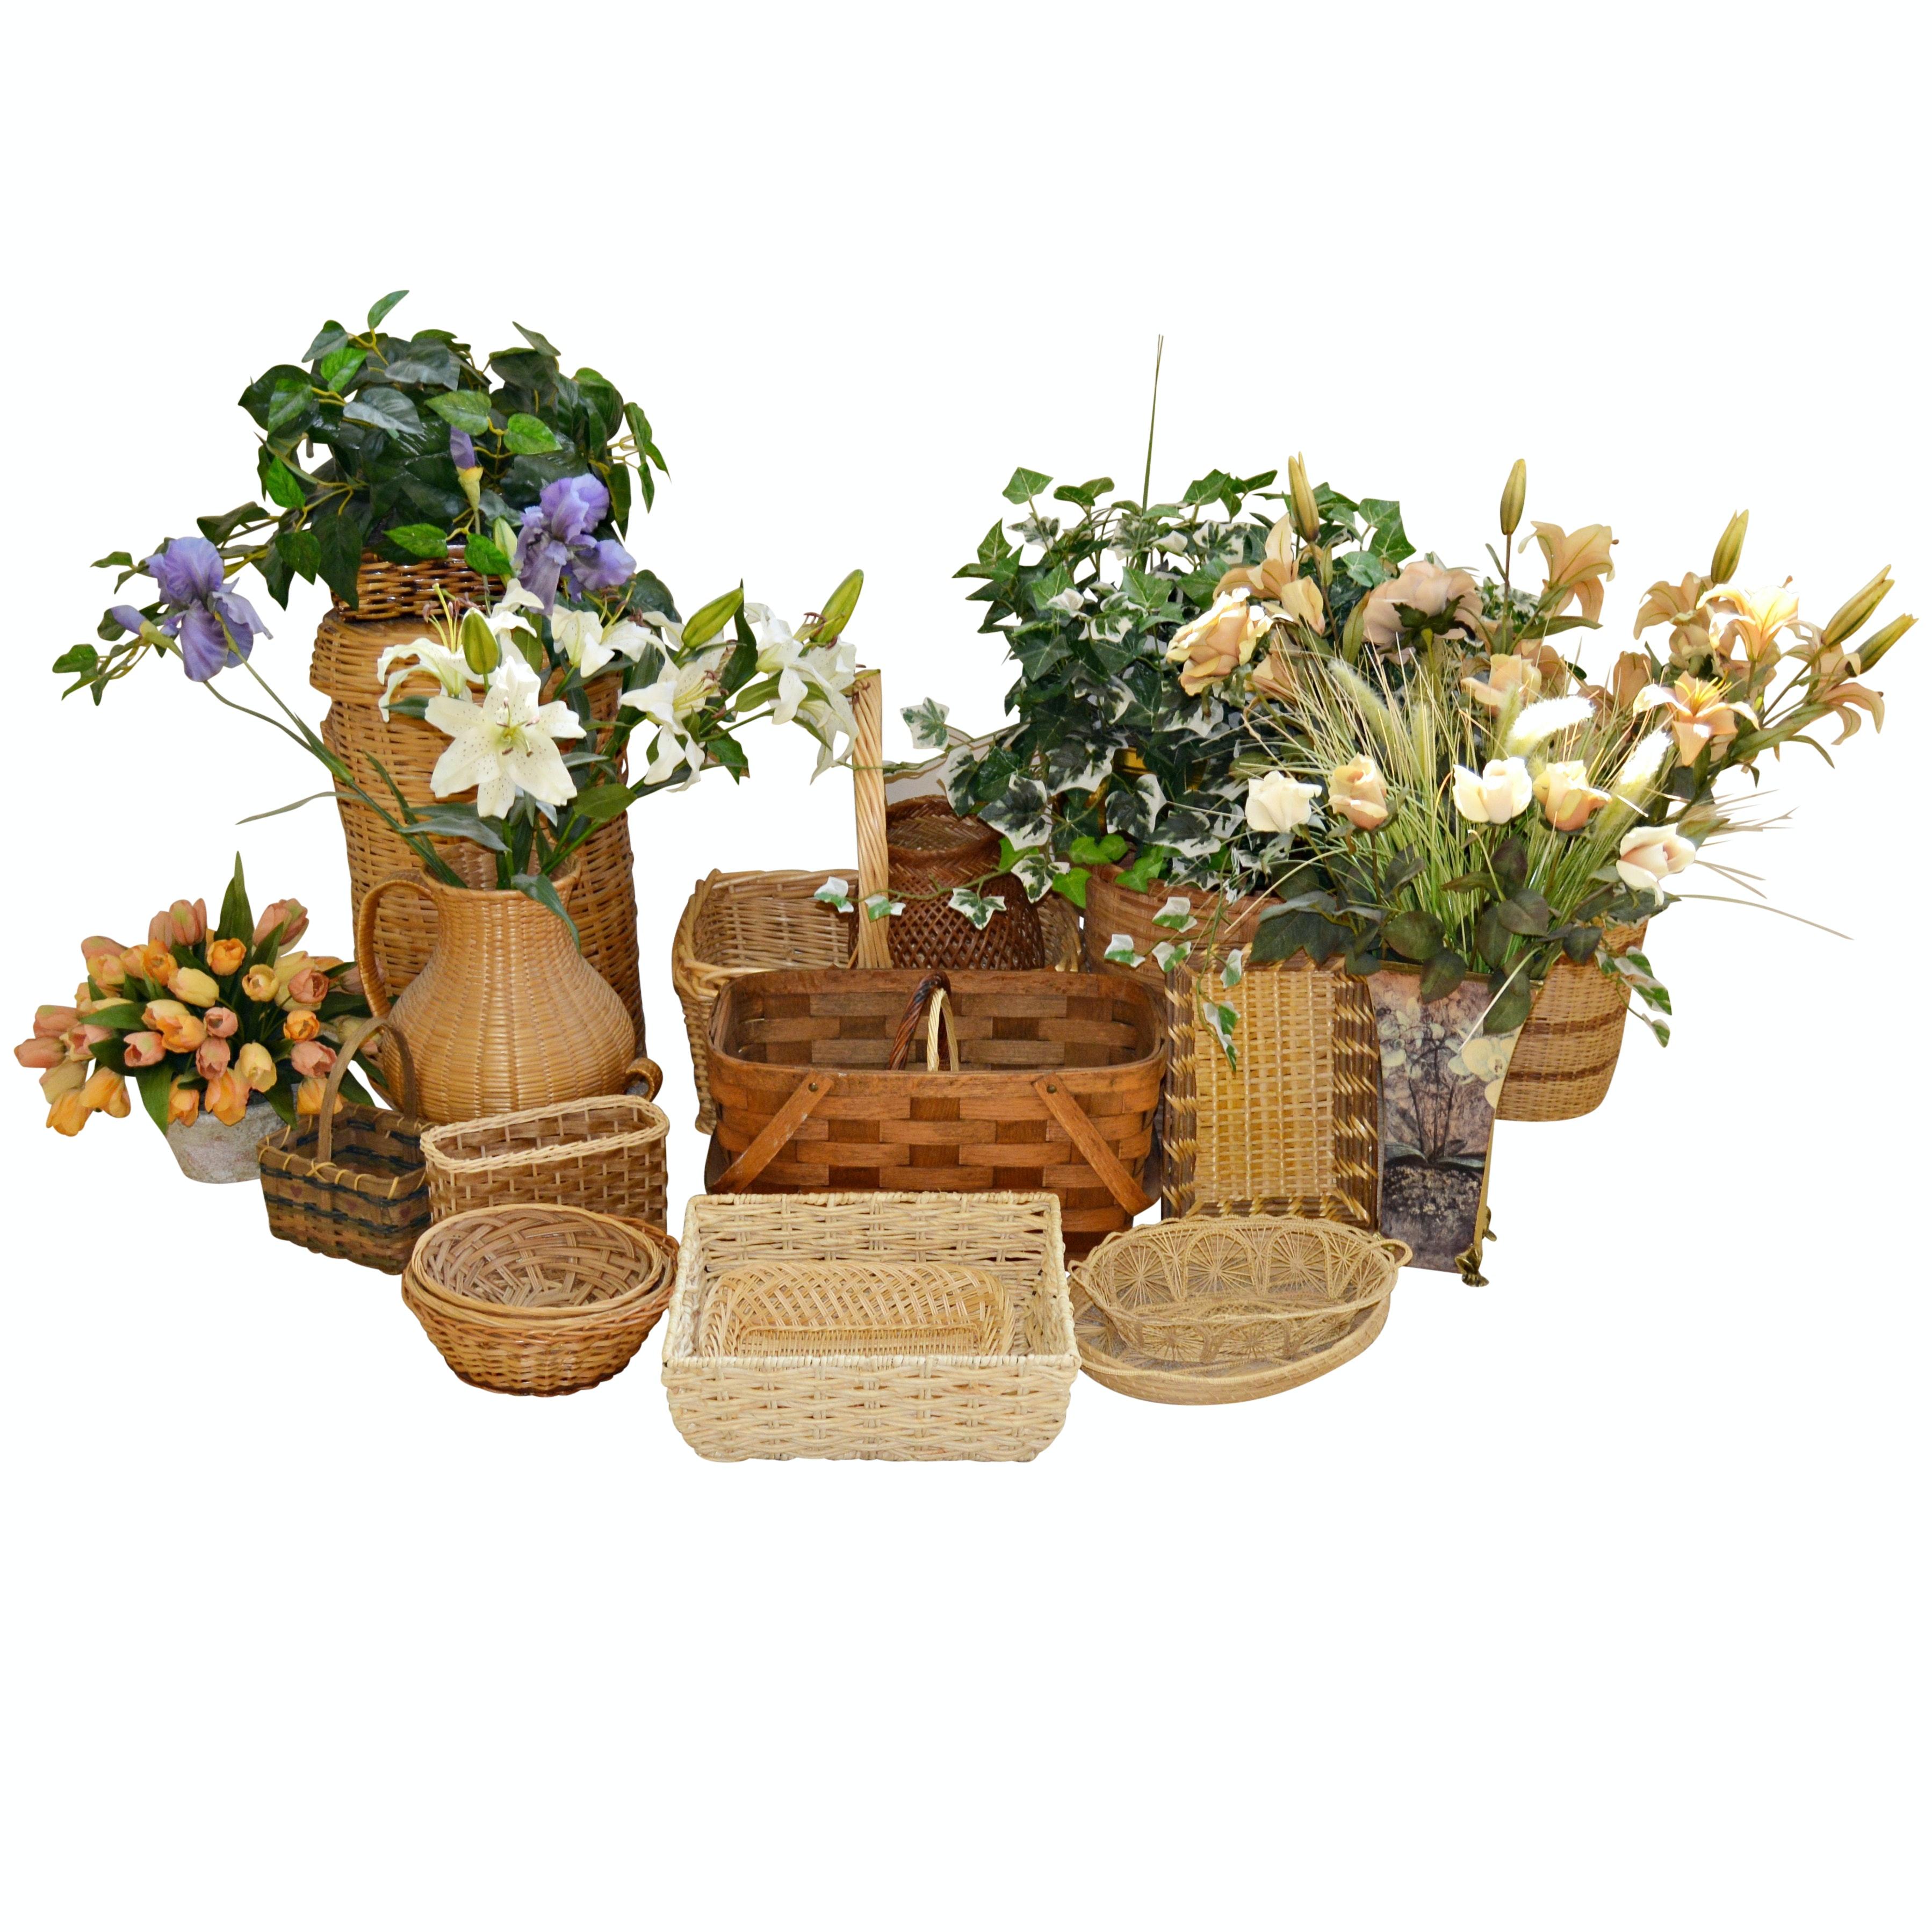 Storage Baskets and Artificial Floral Arrangements